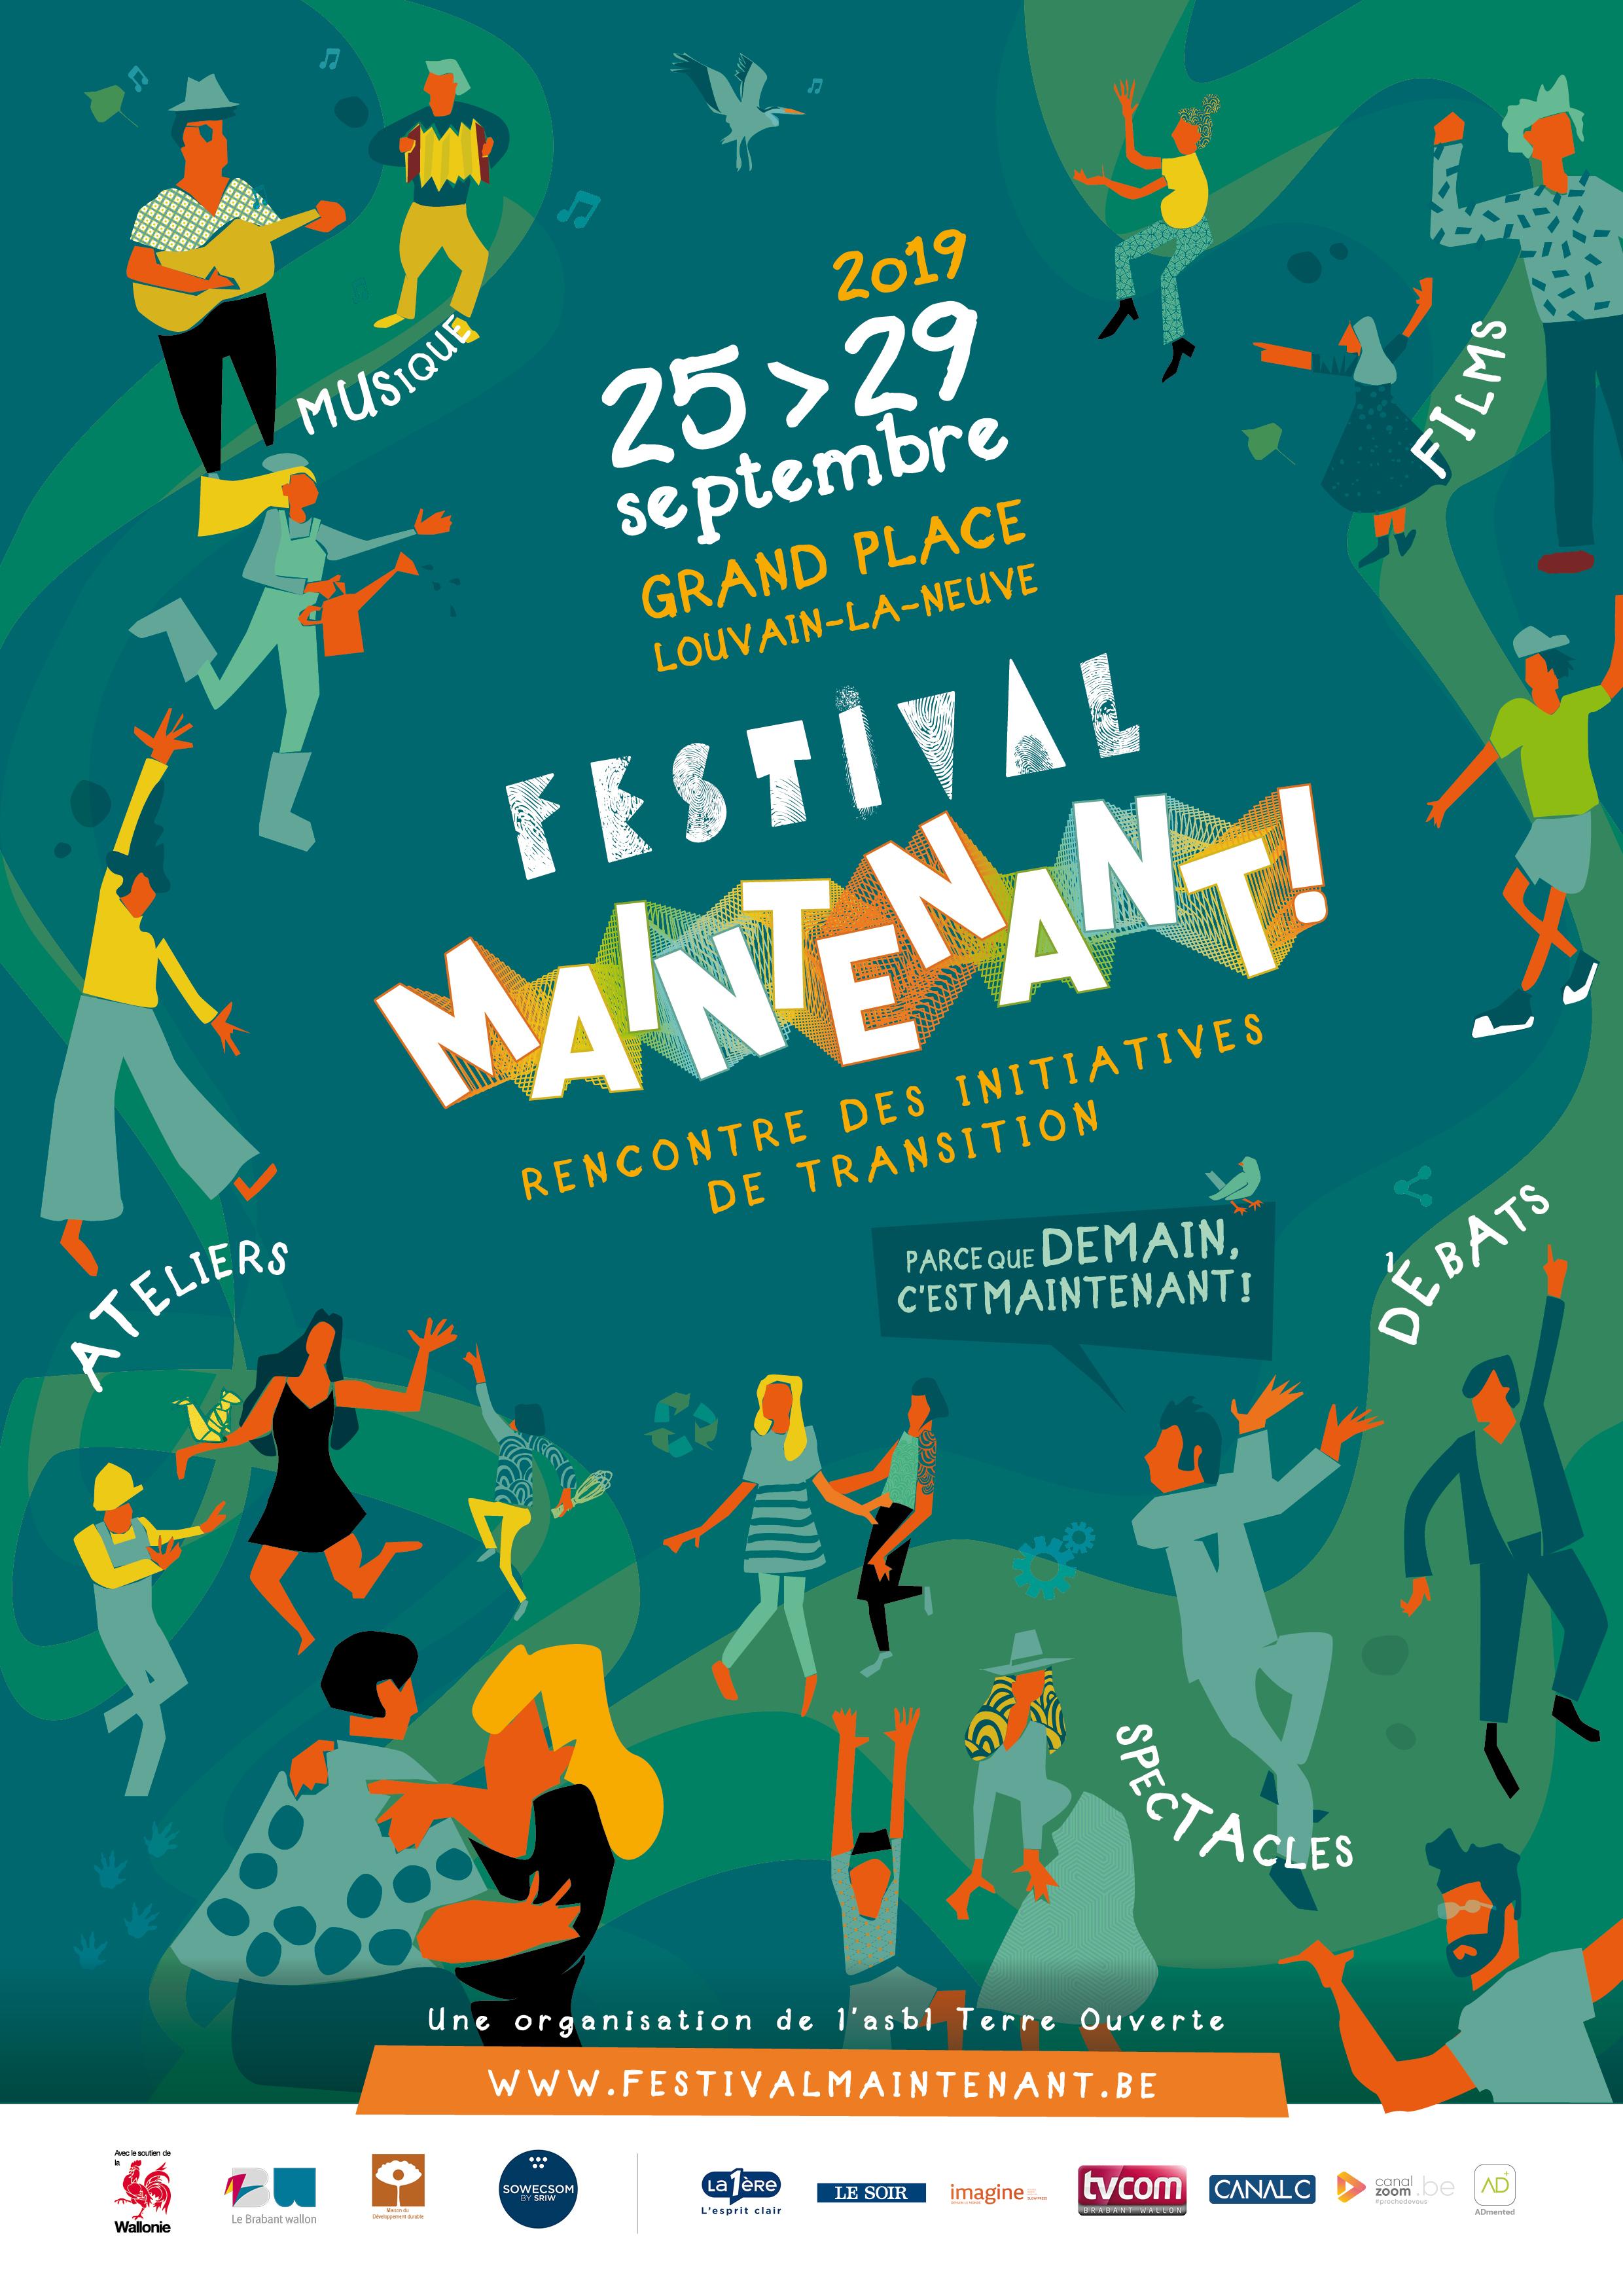 Festival Maintenant!